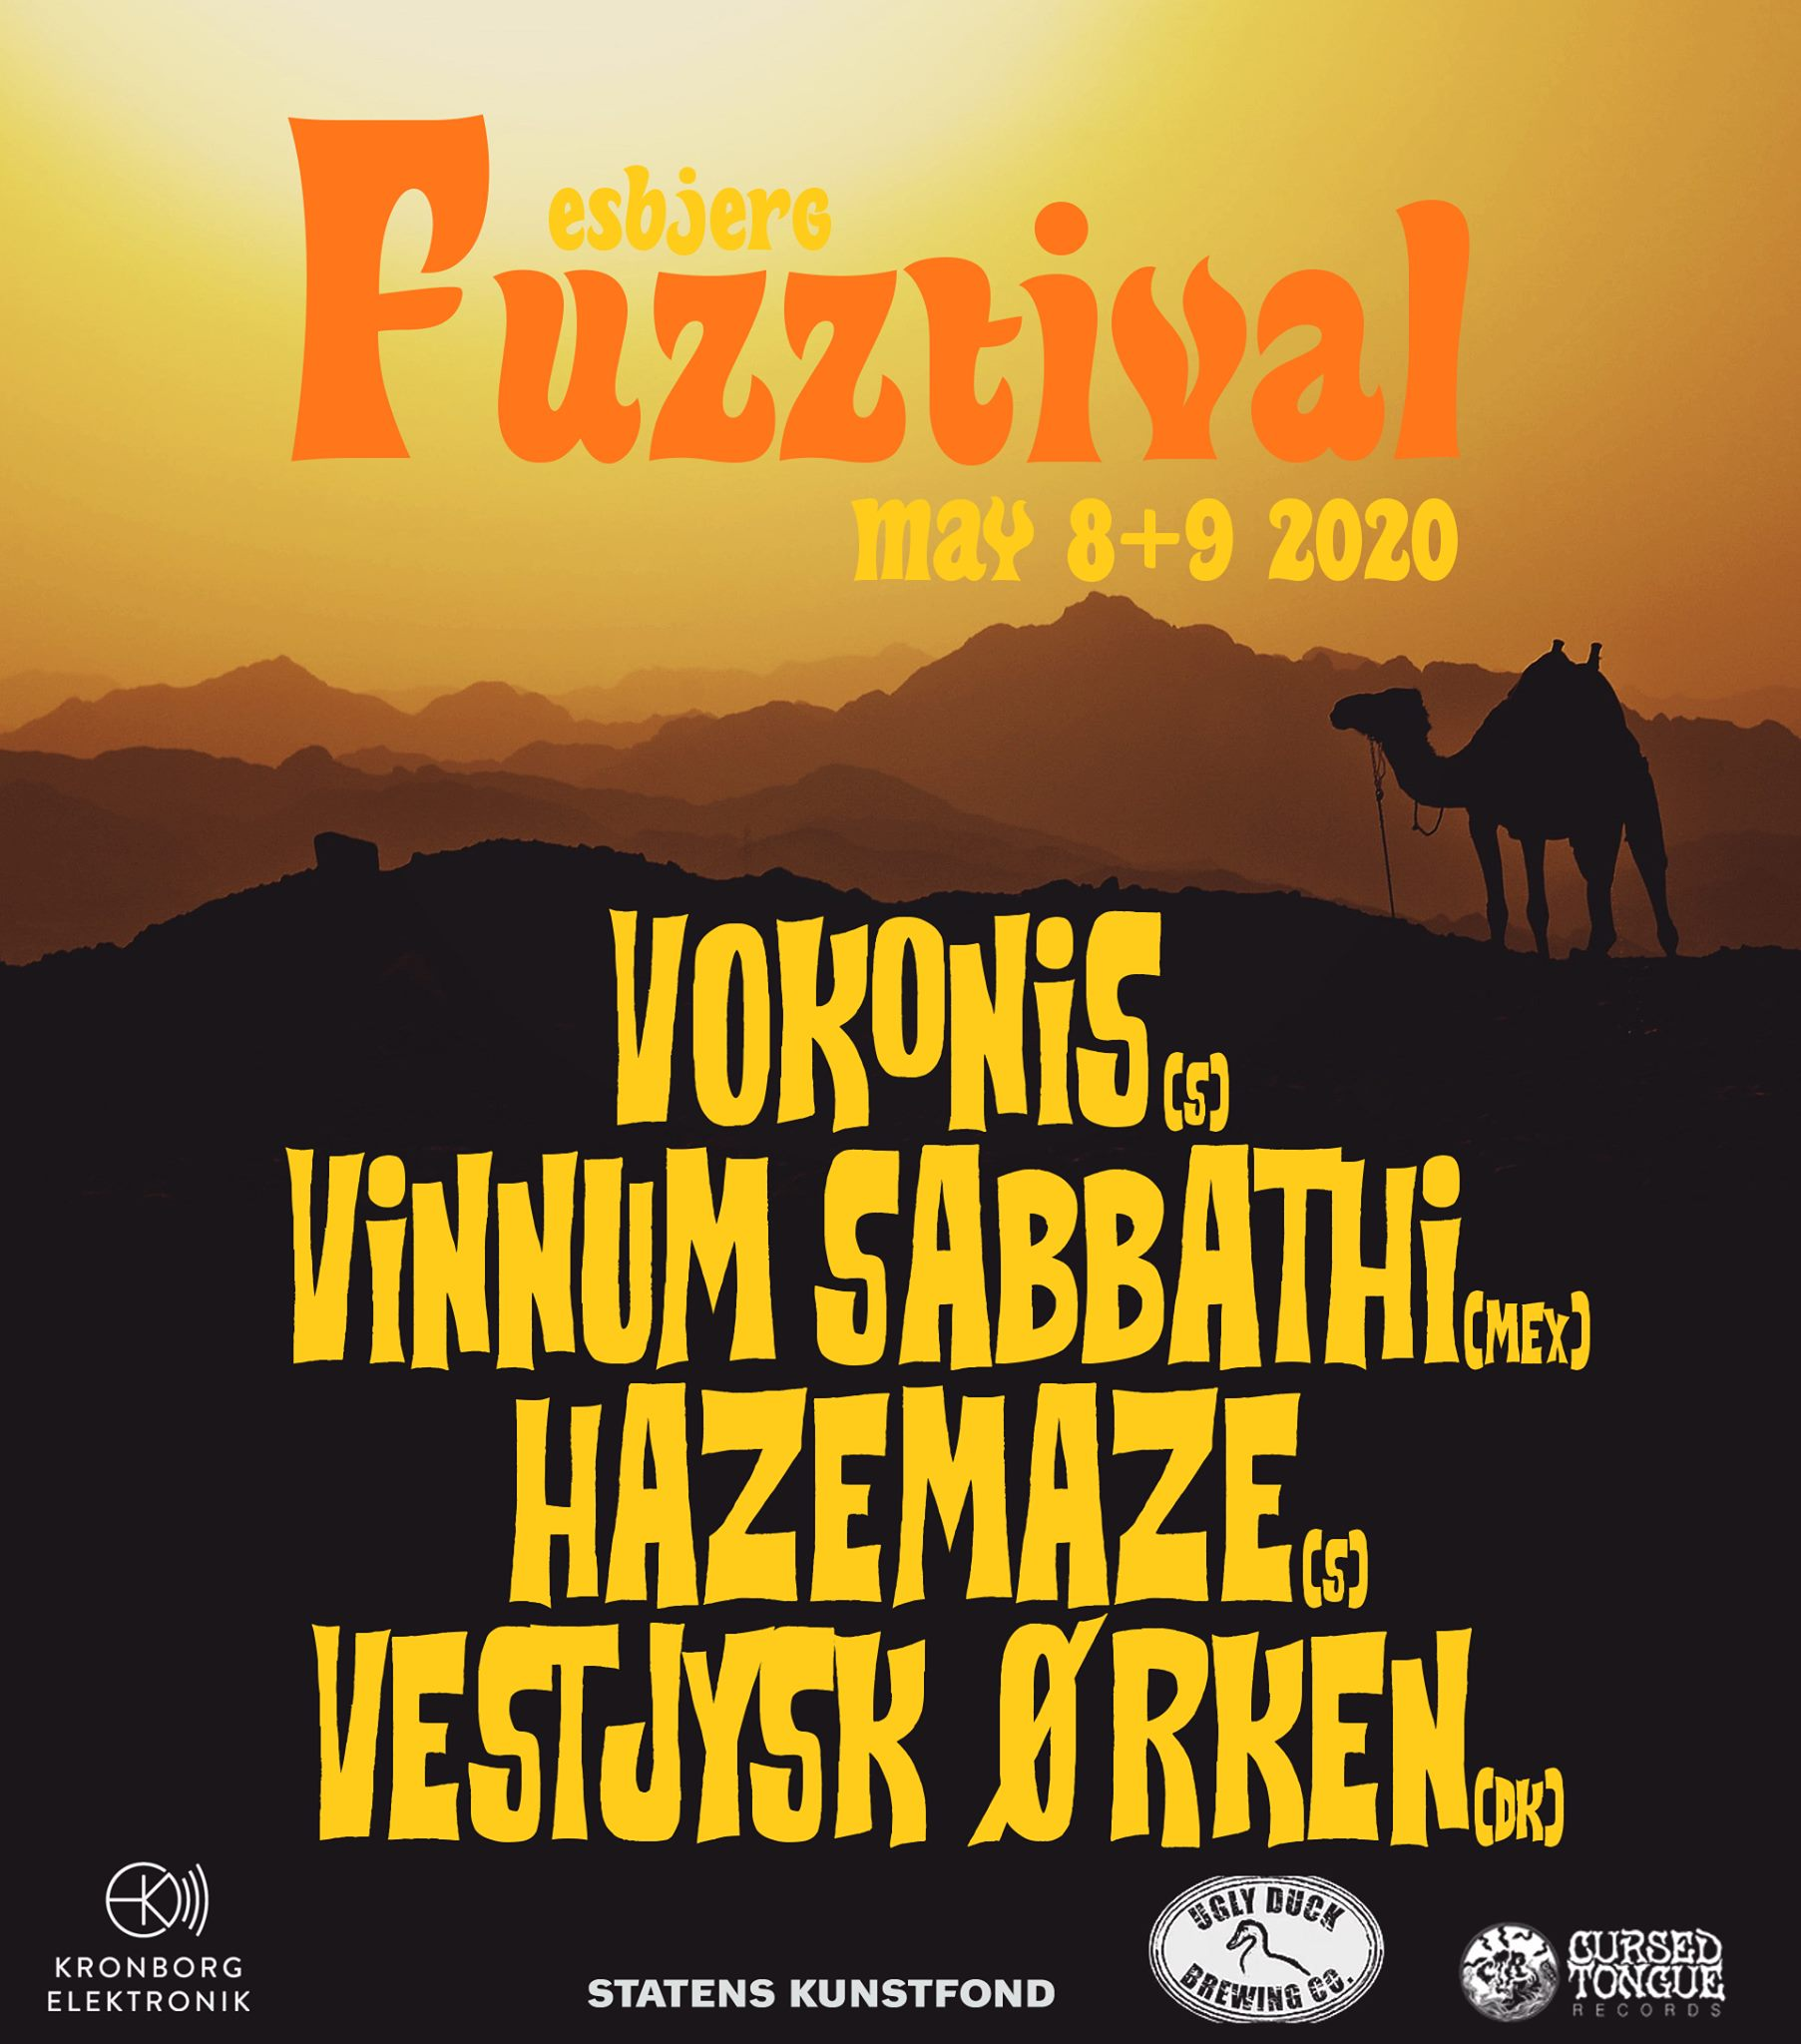 esbjerg fuzztival 2020 first poster